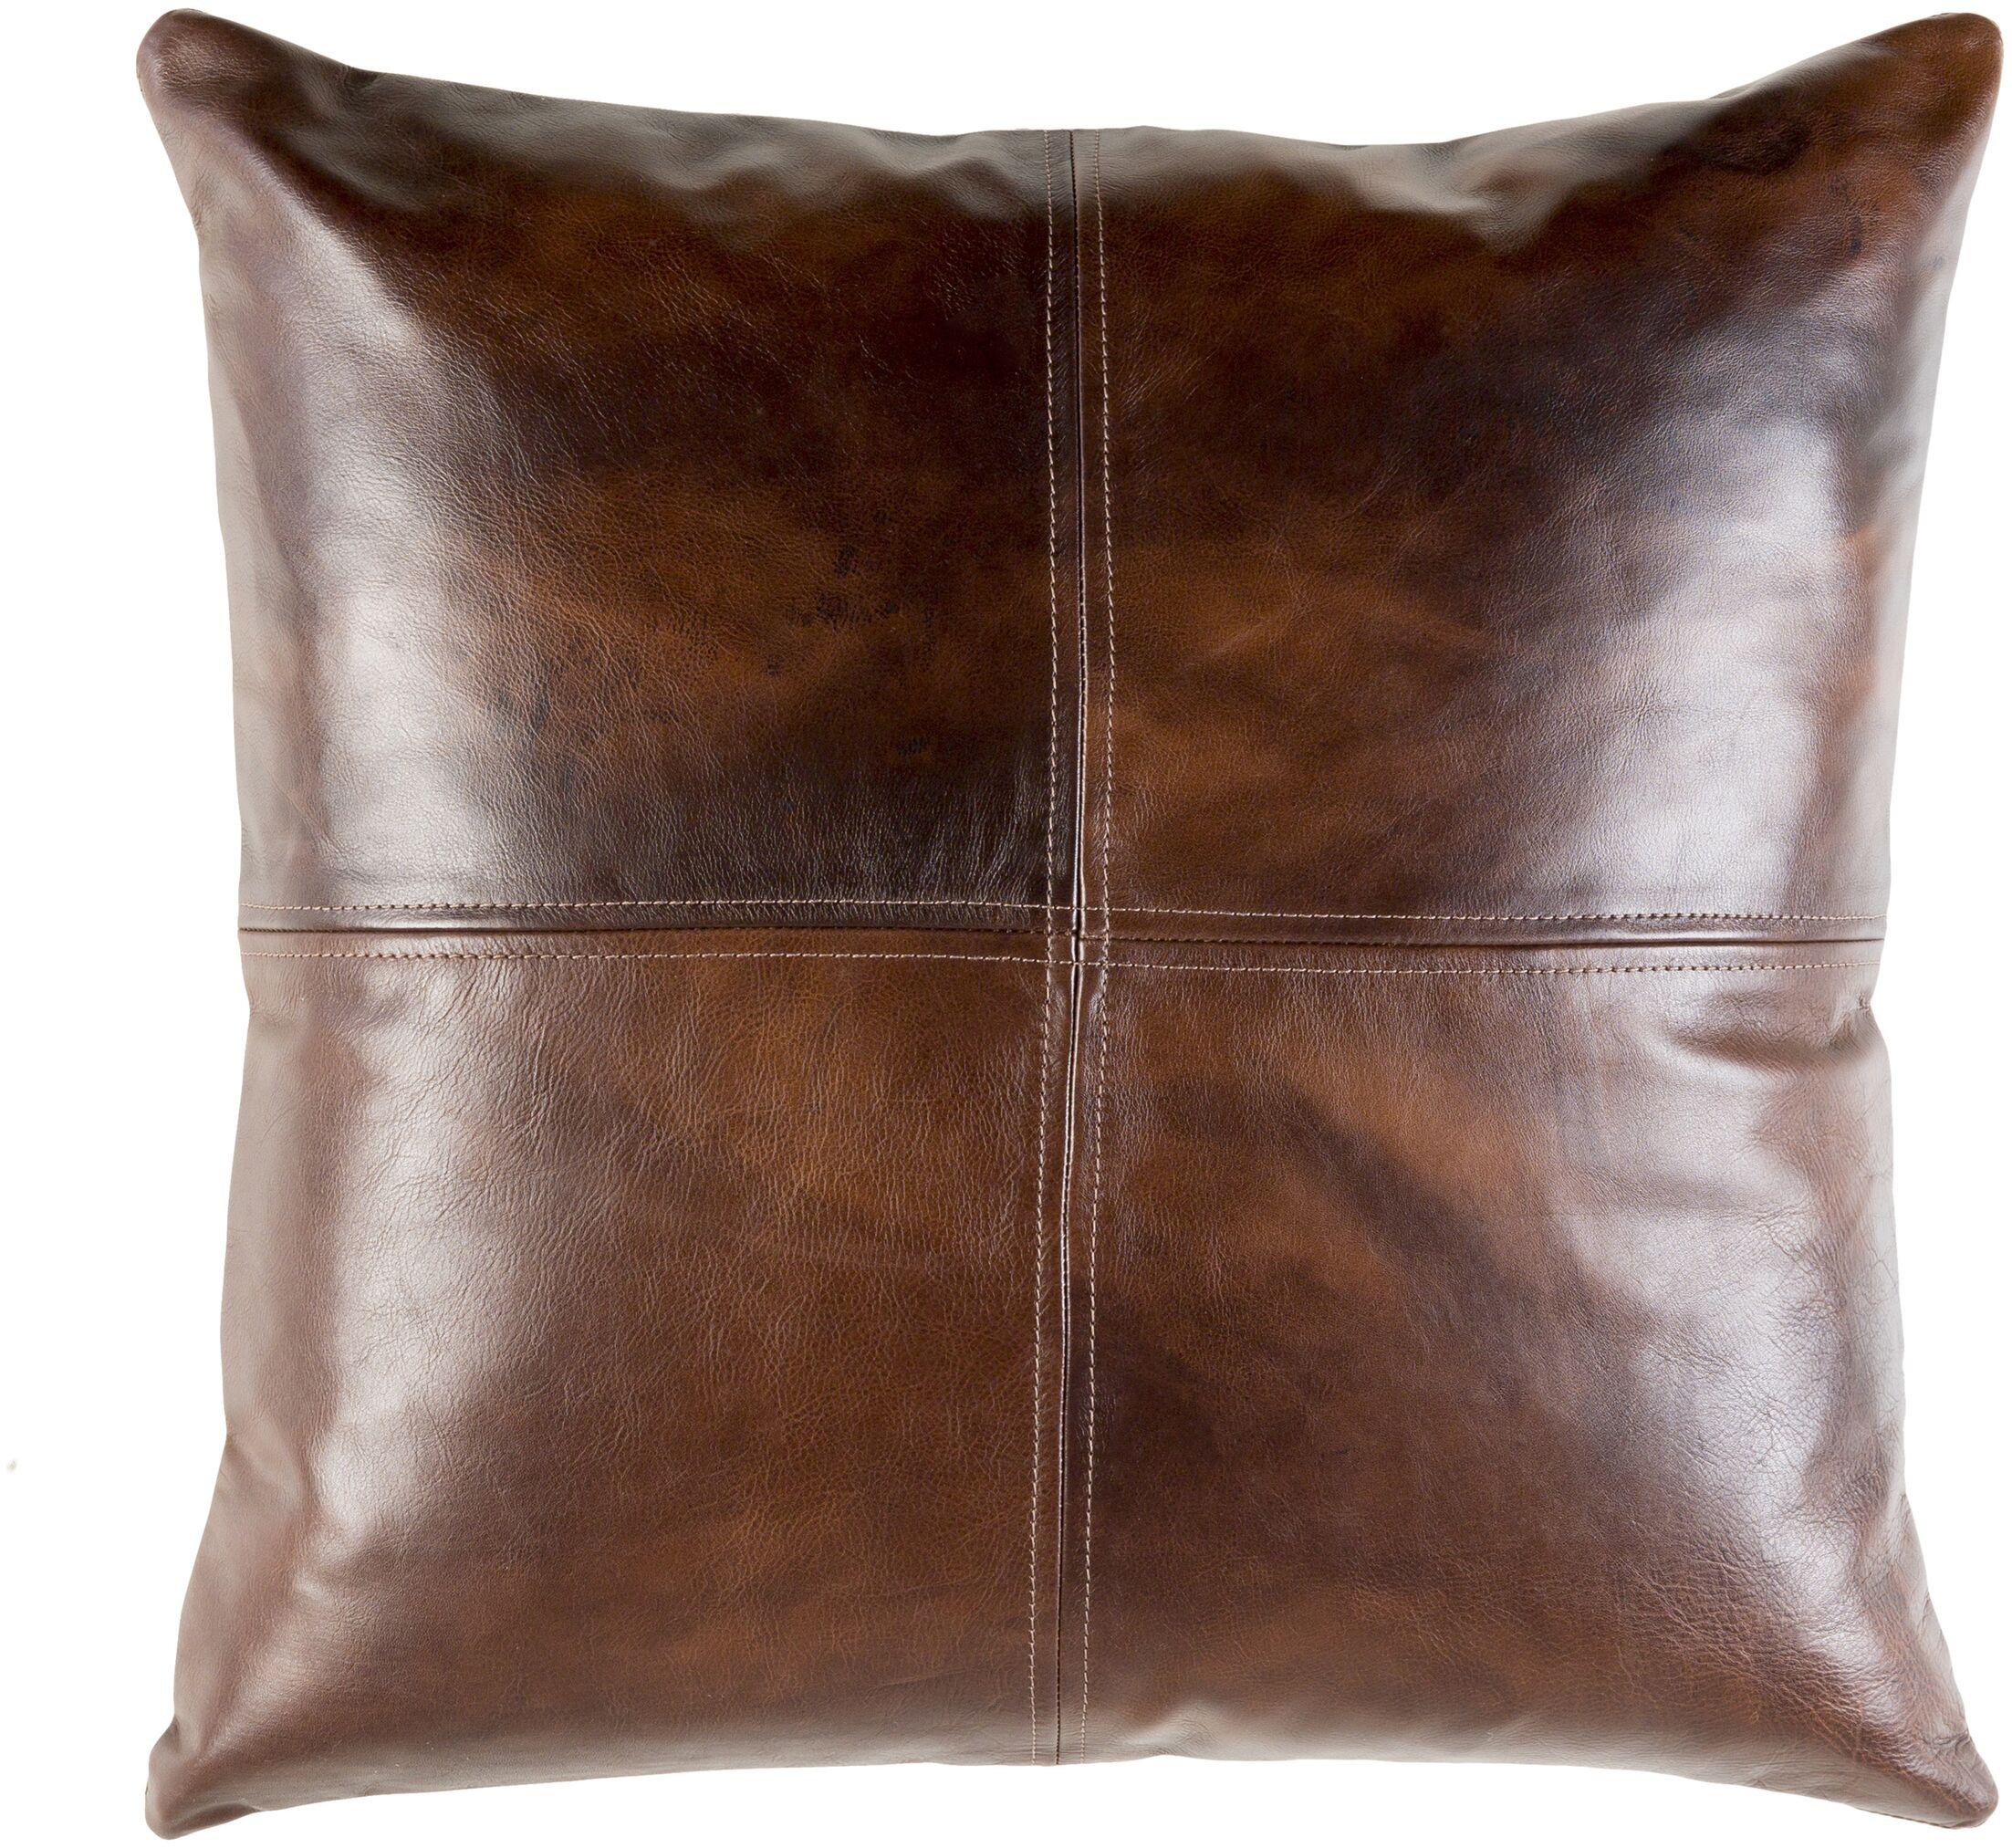 Cecil Pillow Fill Material: Polyfill